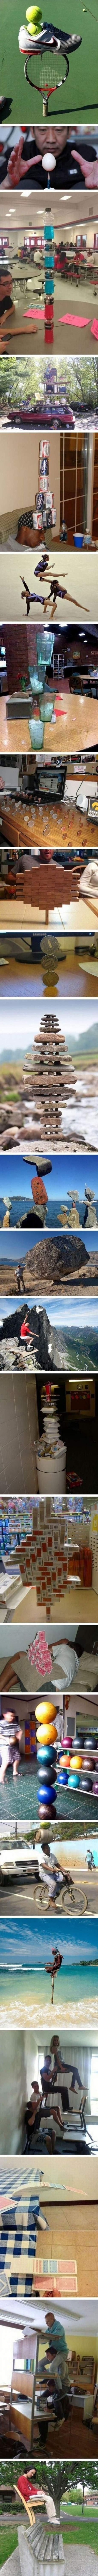 perfectly balanced. .